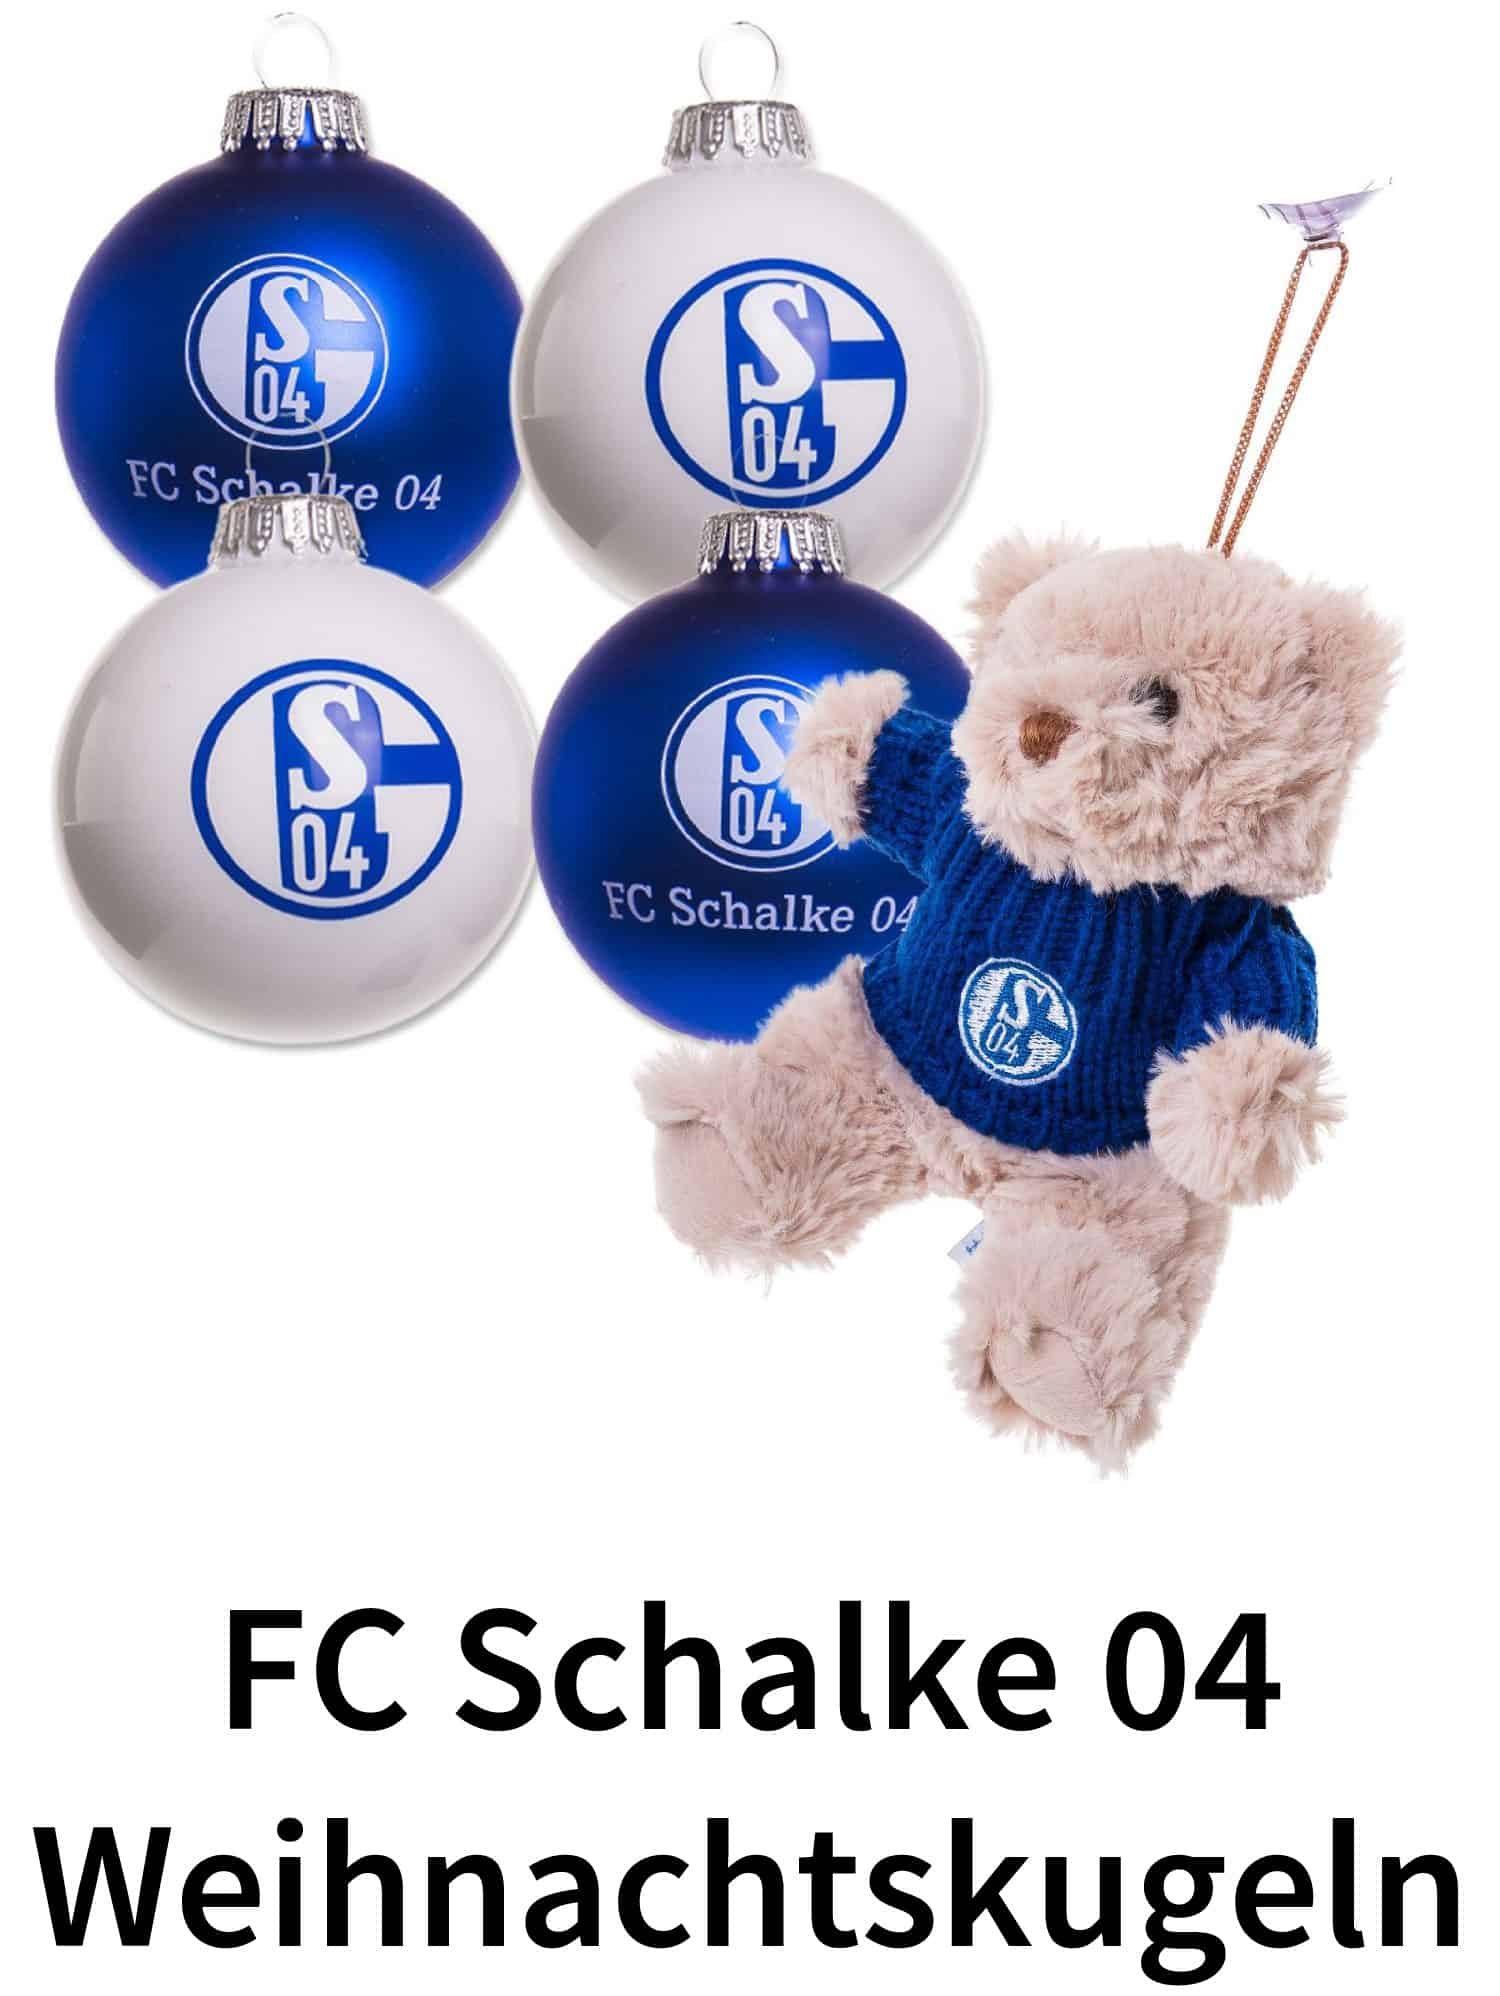 Fc schalke 04 weihnachtskugeln fu ball christbaumkugeln - Weihnachtskugeln durchsichtig ...